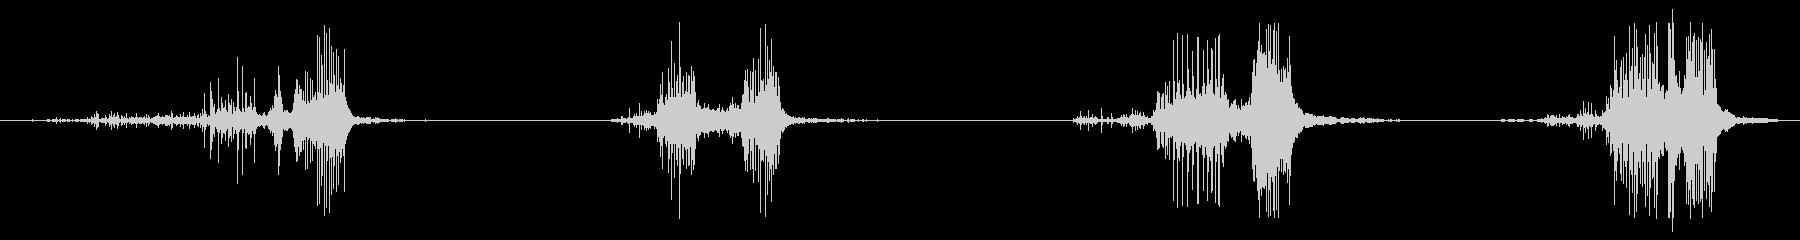 ASMR ビニールをビリビリにする音の未再生の波形